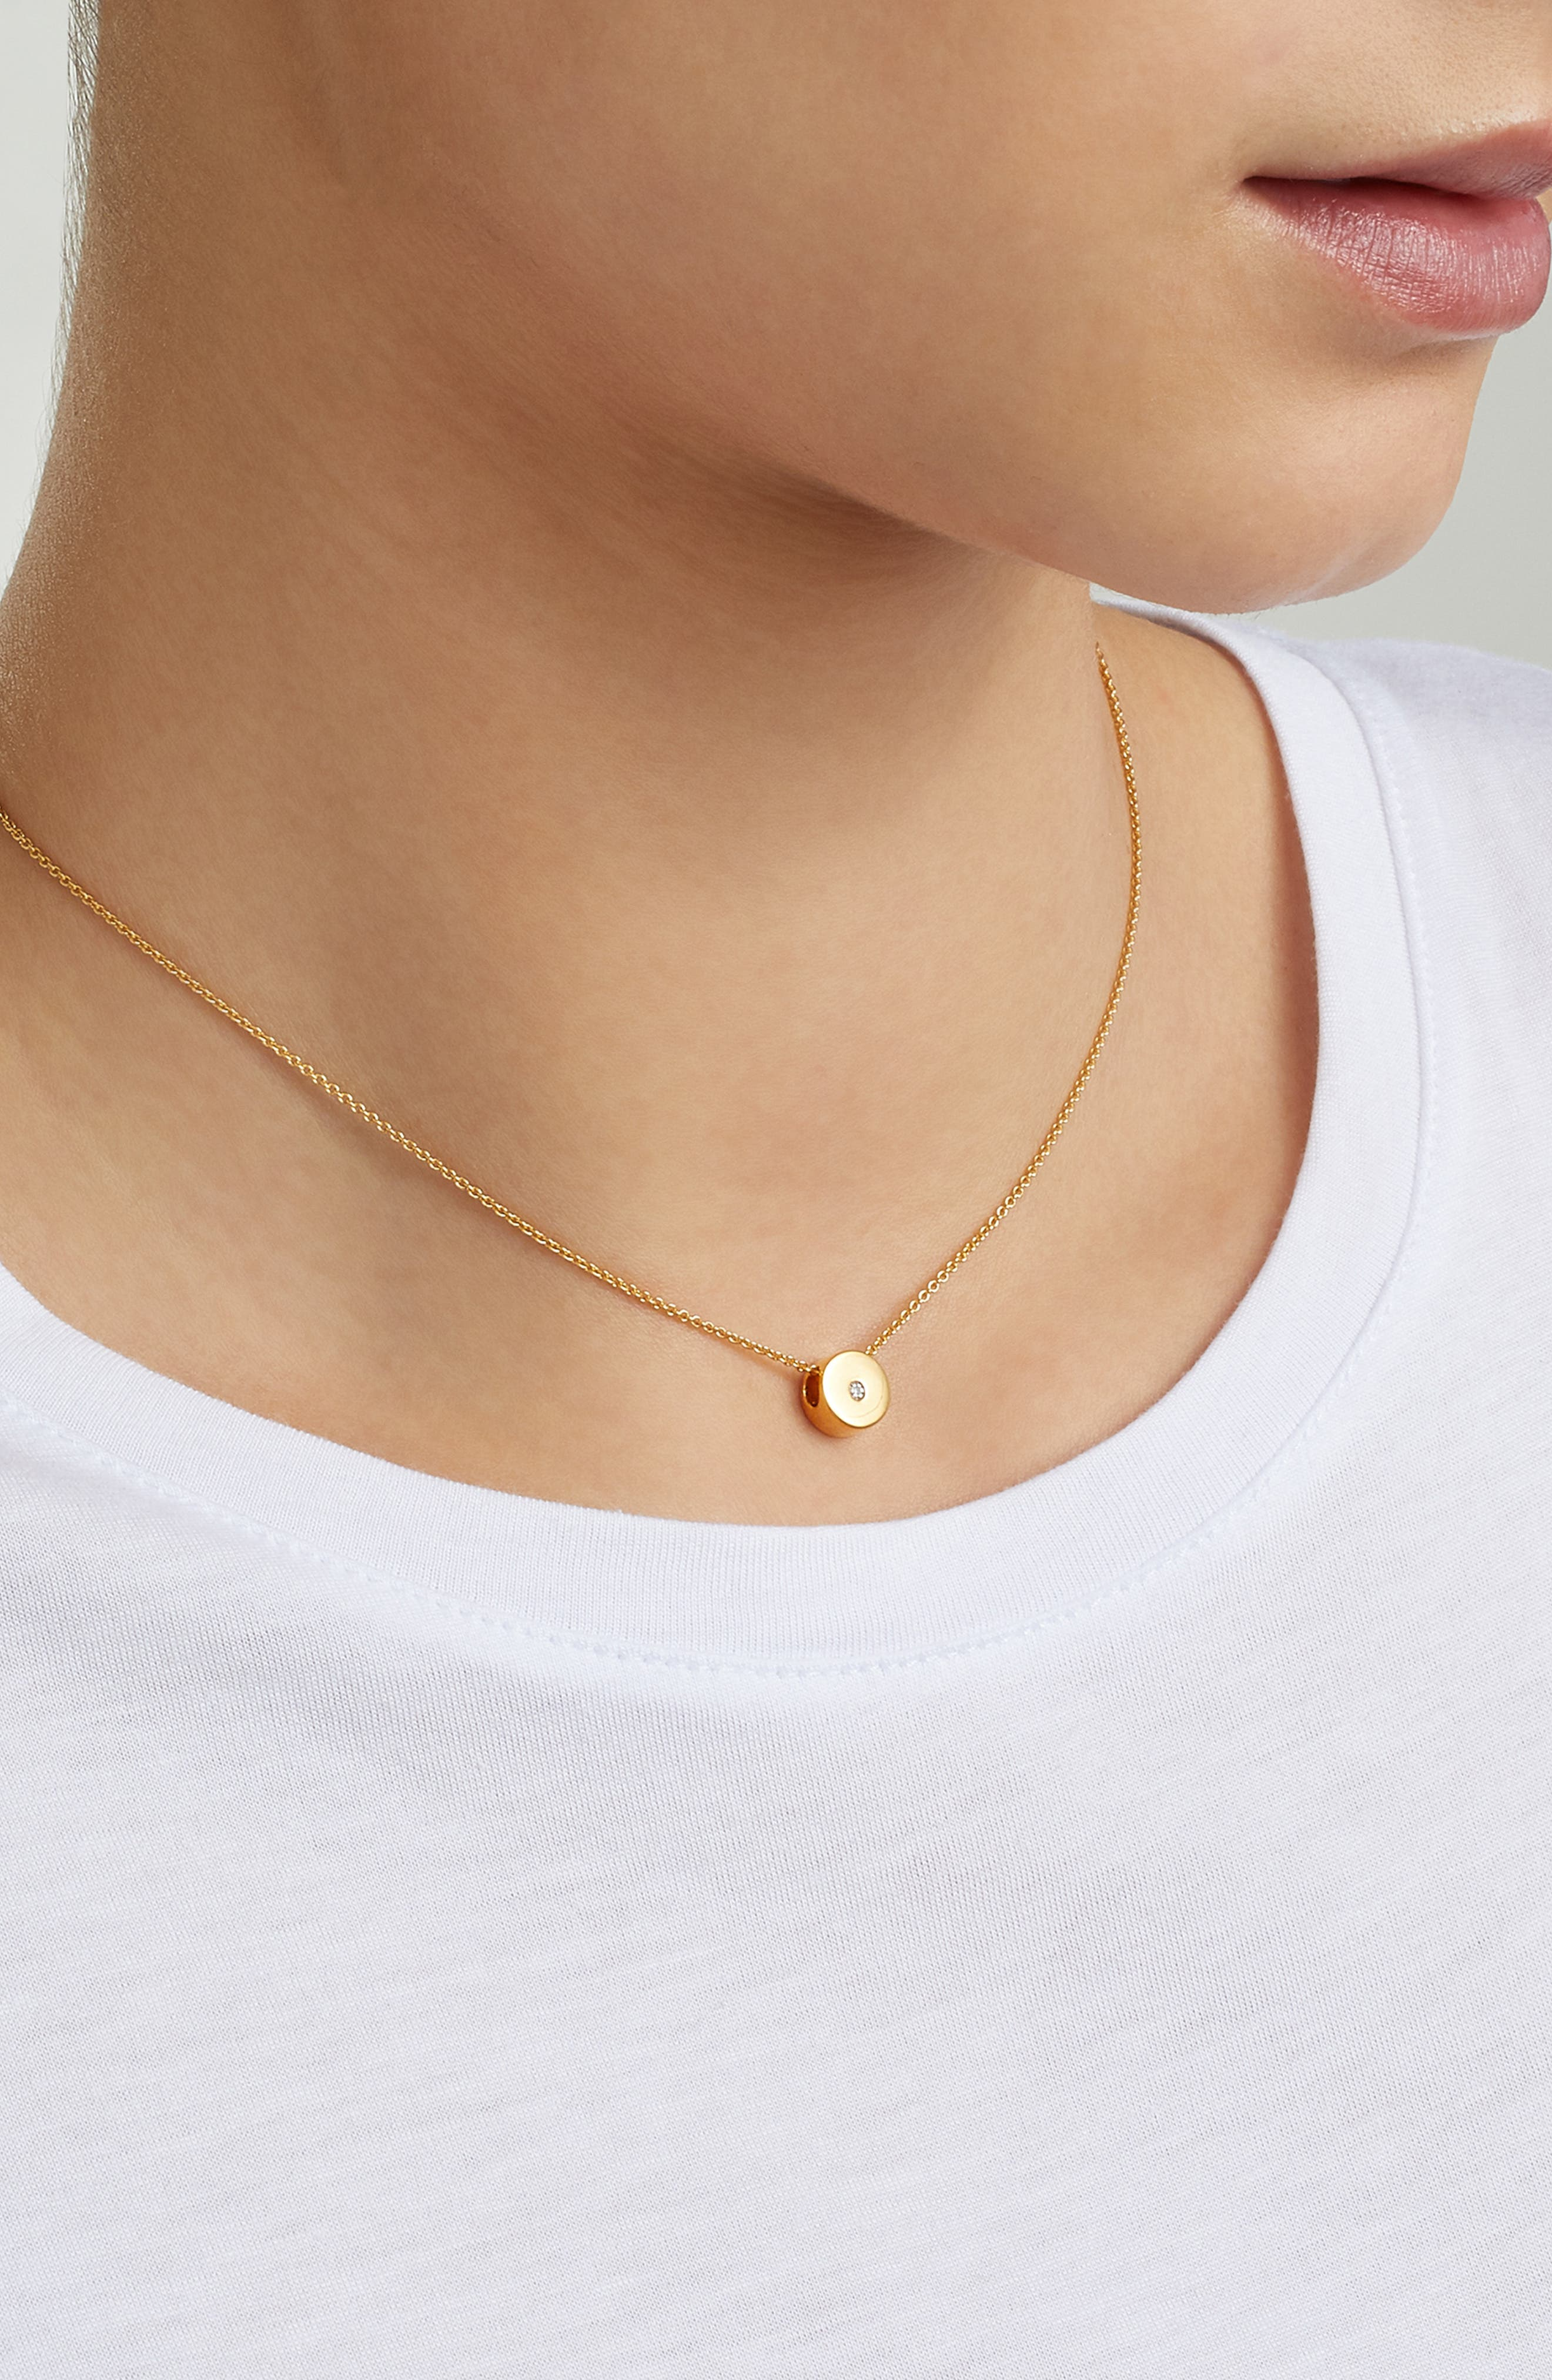 MONICA VINADER, Linear Solo Diamond Pendant Necklace, Alternate thumbnail 2, color, GOLD/ DIAMOND